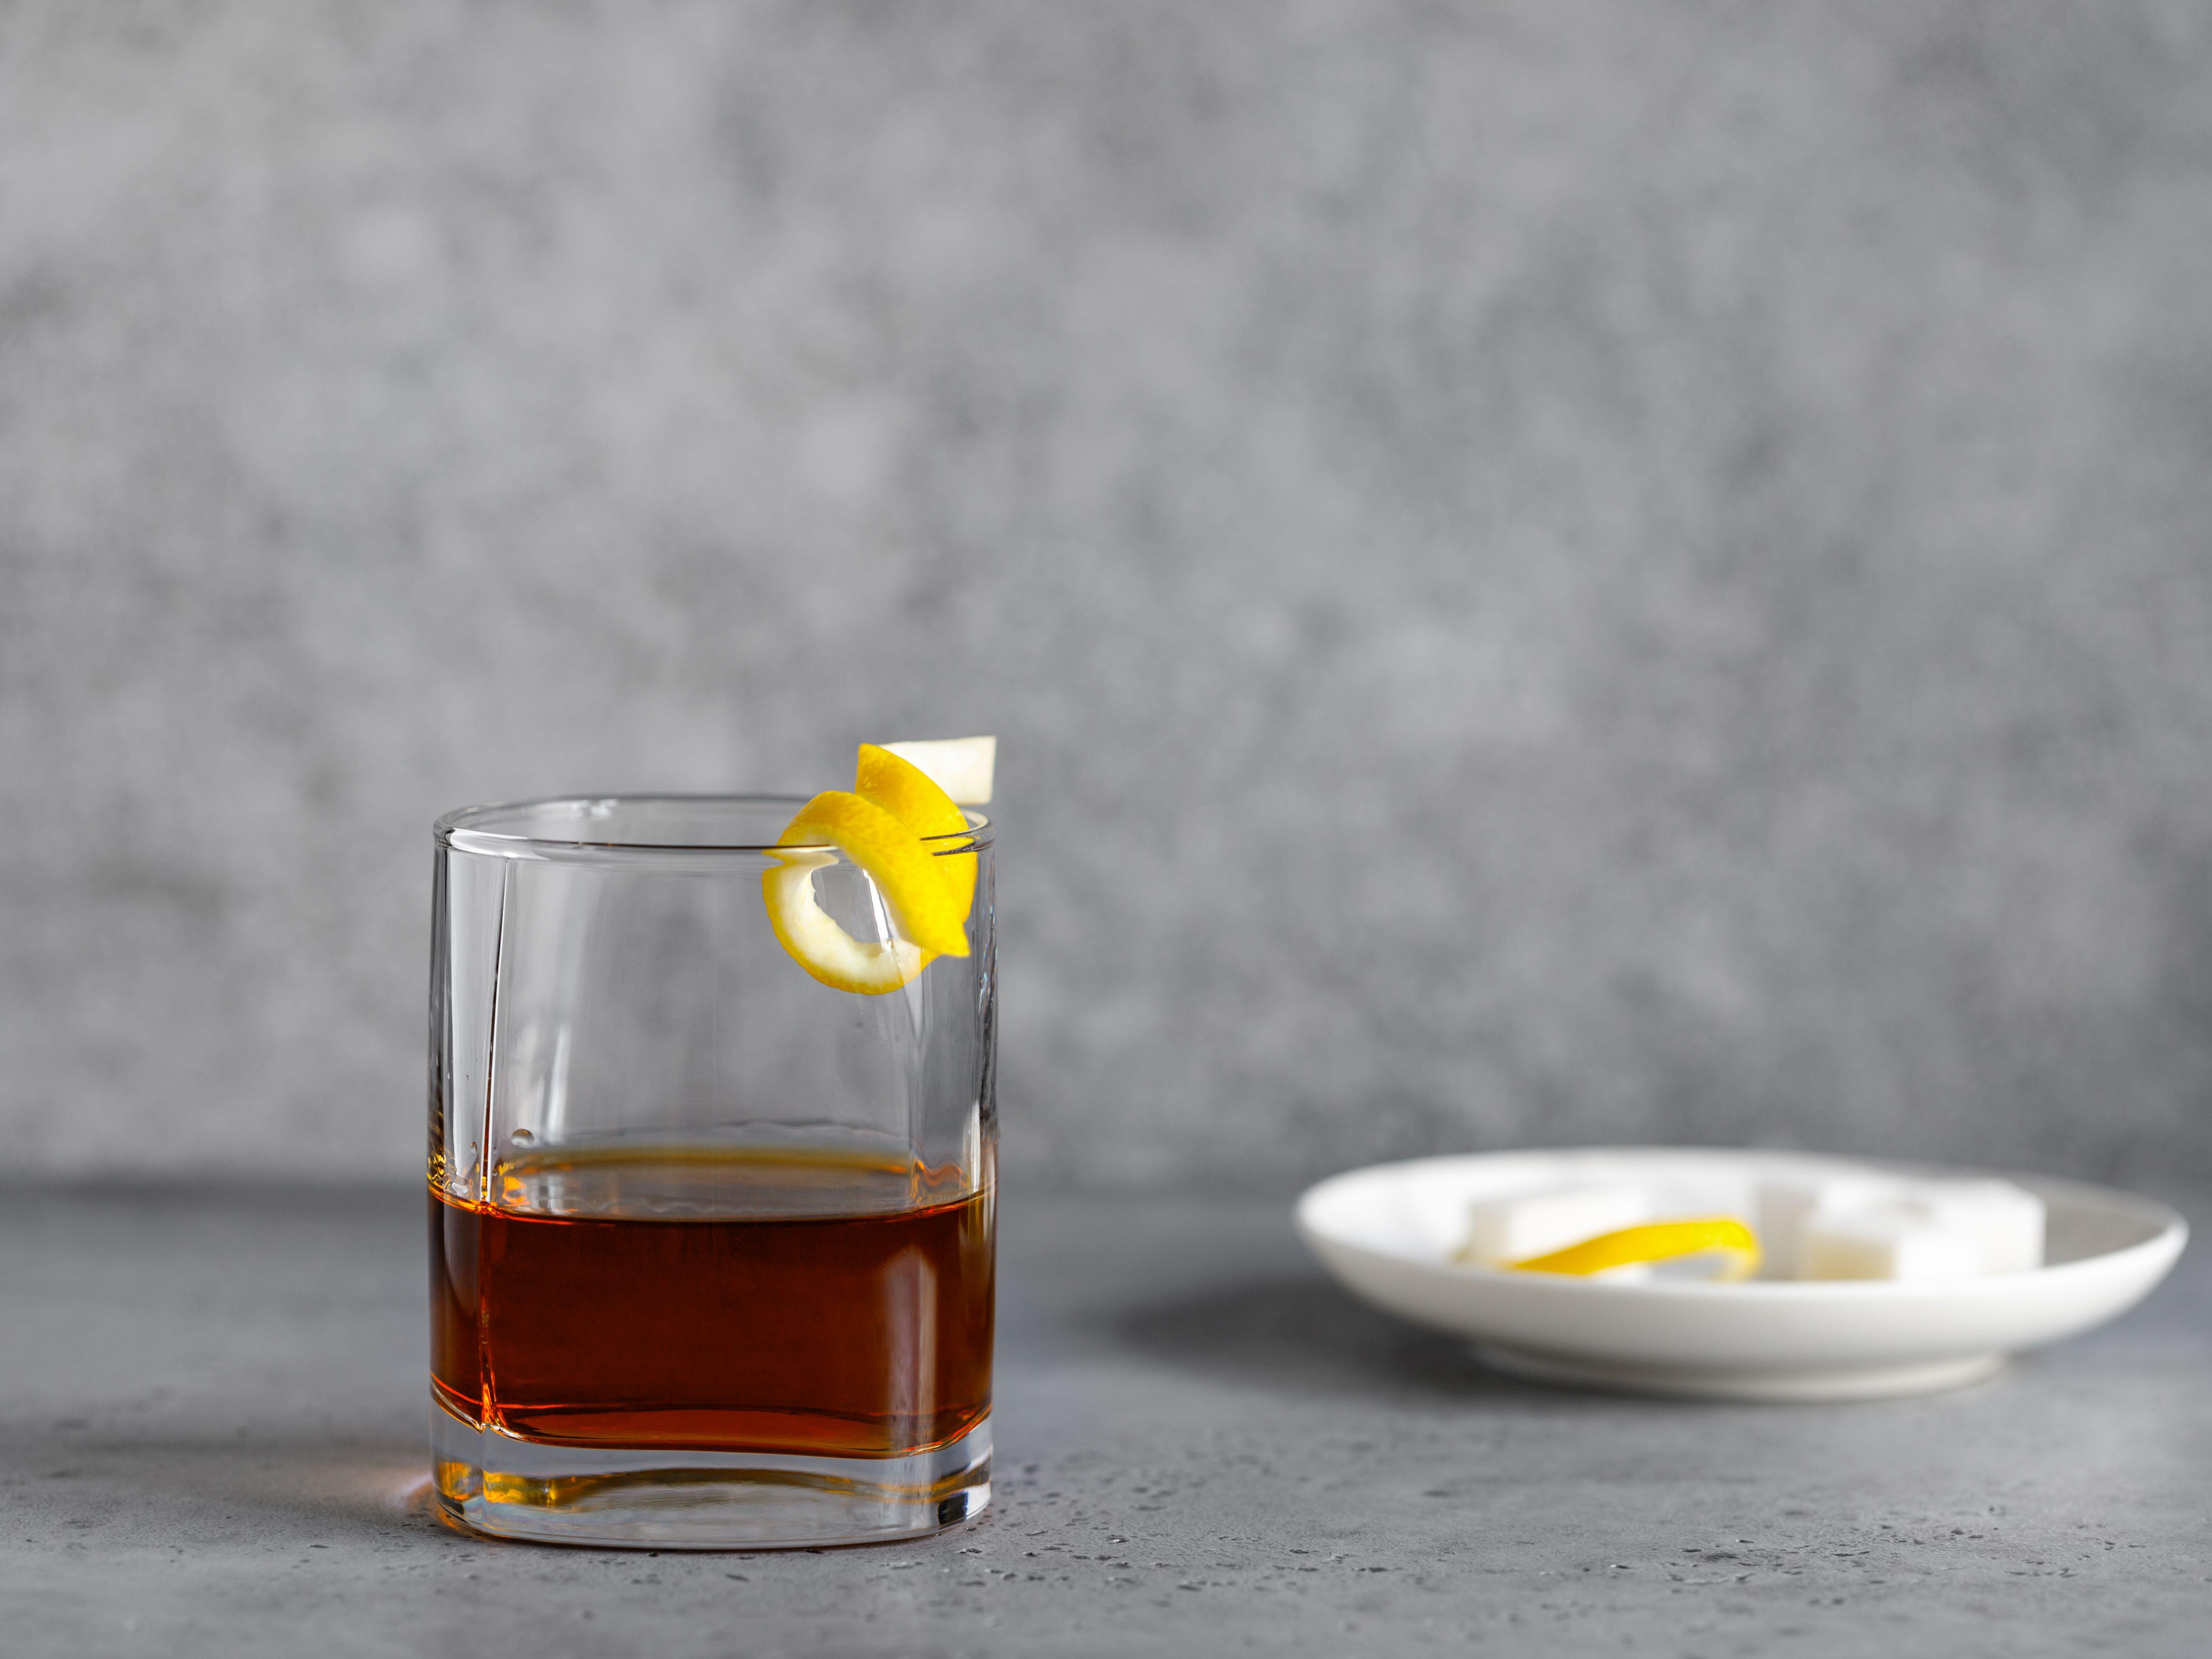 Garnish the Sazerac with a lemon twist